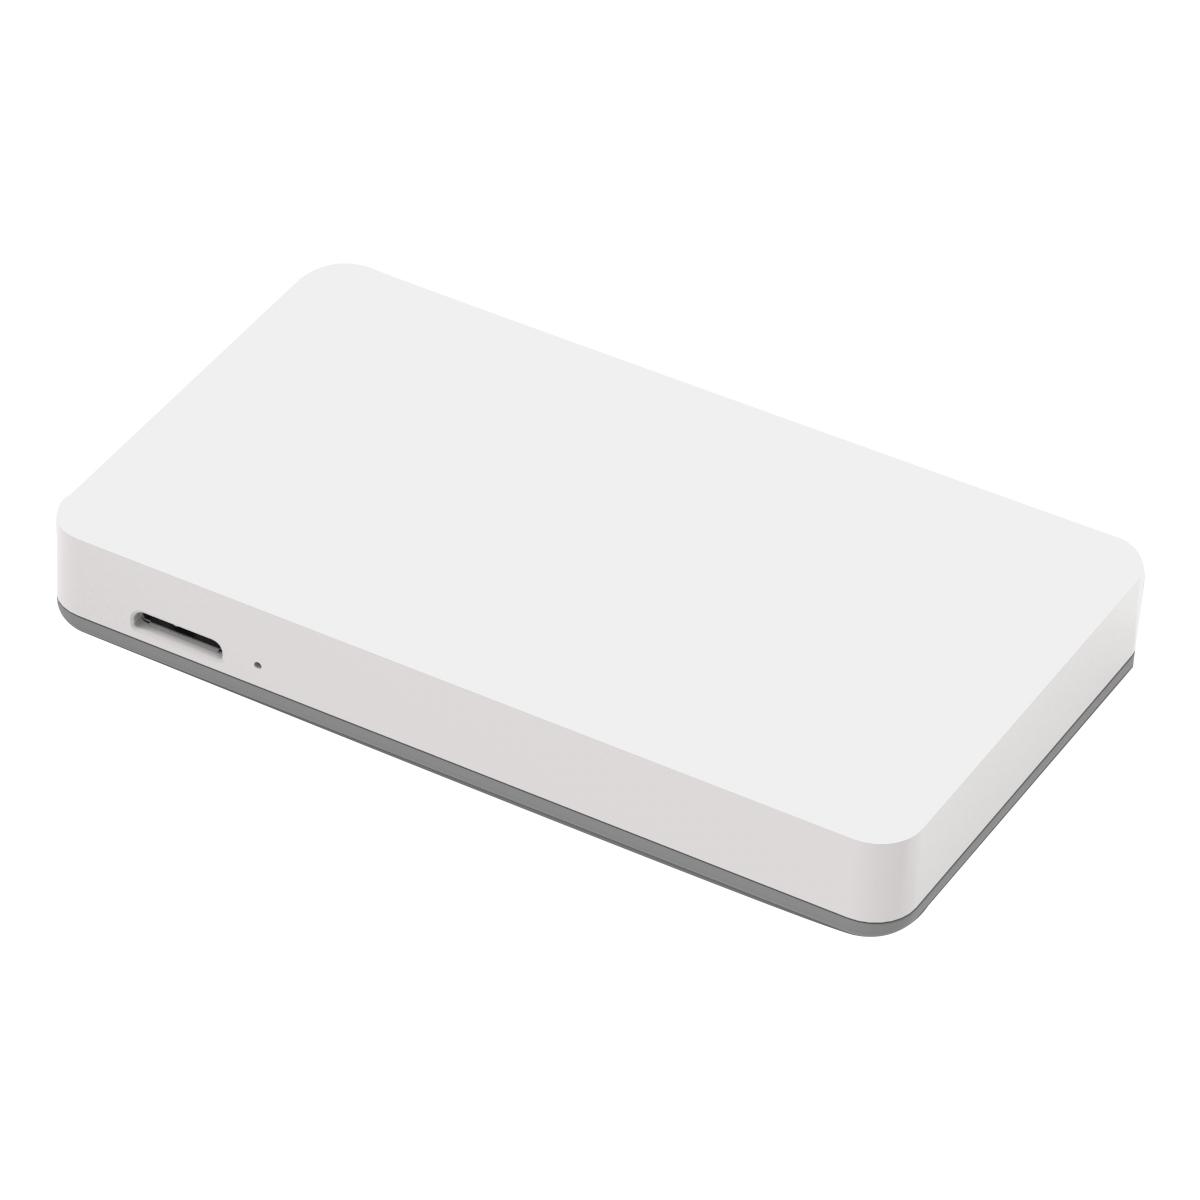 325342716-816 - Mosaic 2.0 16GB Media Hub Power Bank - thumbnail